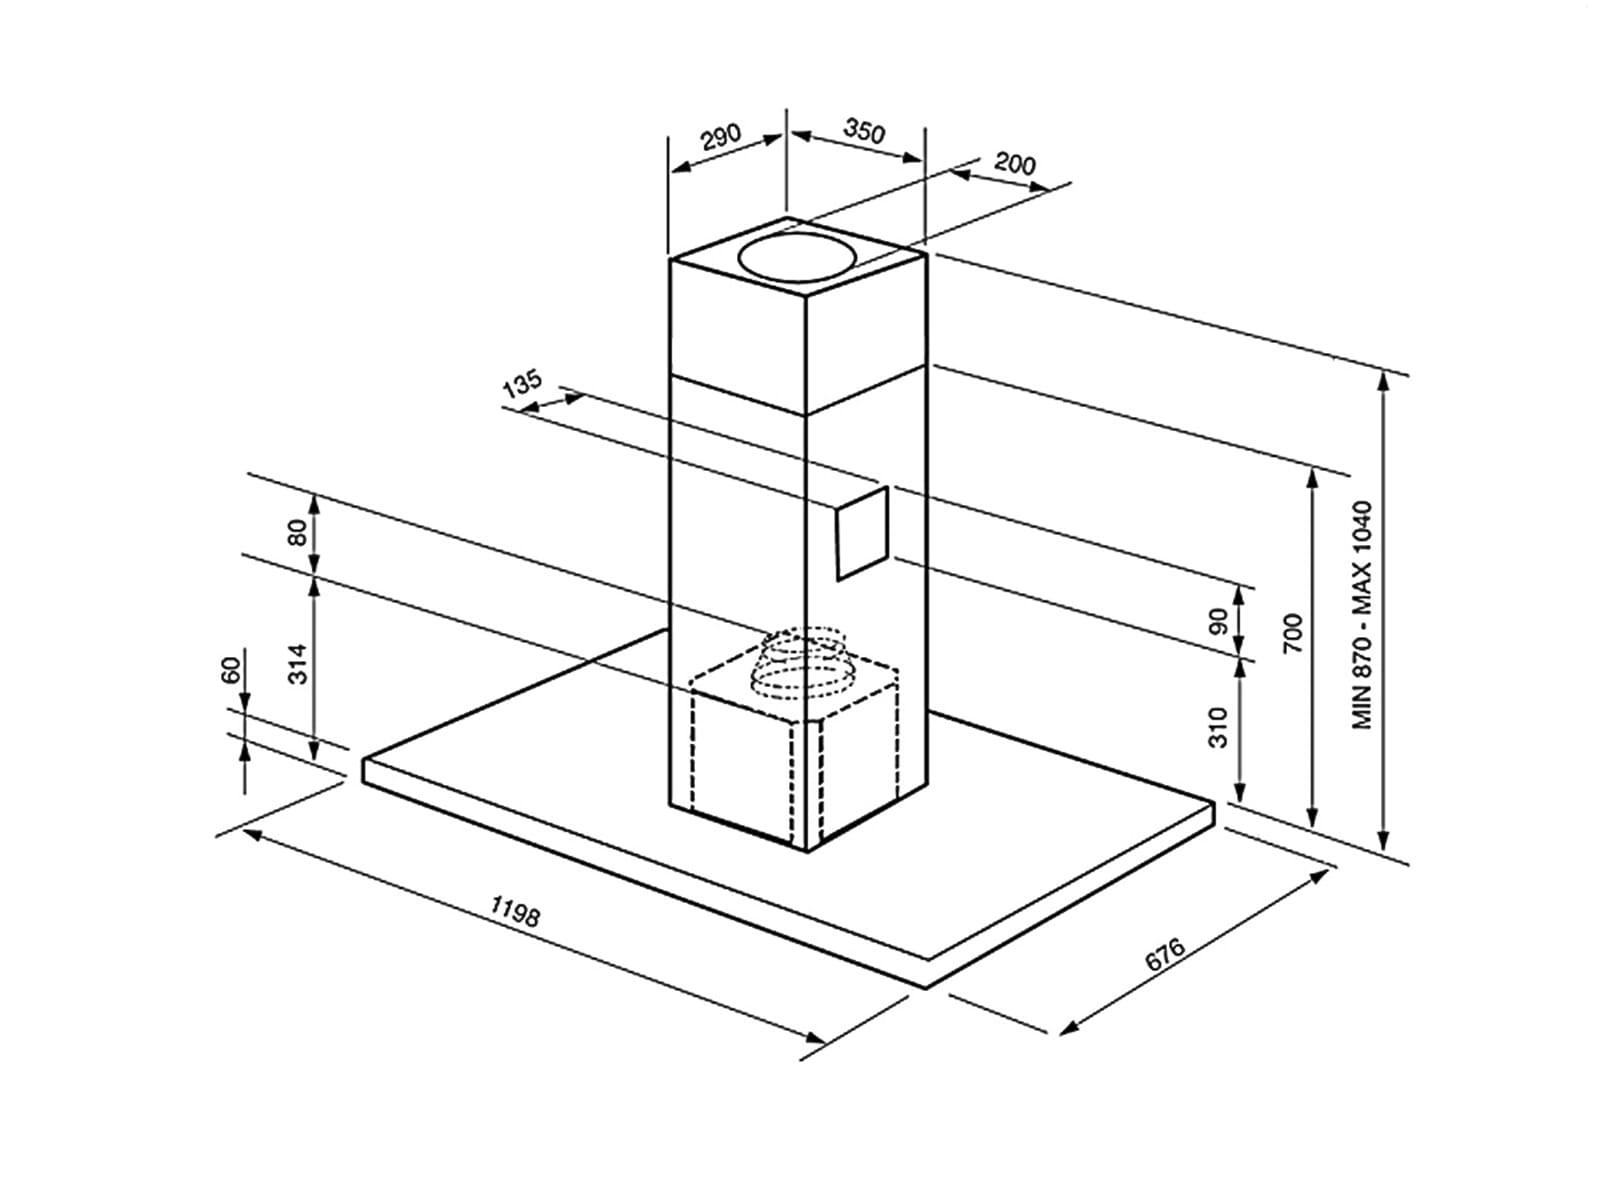 smeg ki120x 2 insel dunstabzugshaube edelstahl f r 999 00 eur. Black Bedroom Furniture Sets. Home Design Ideas